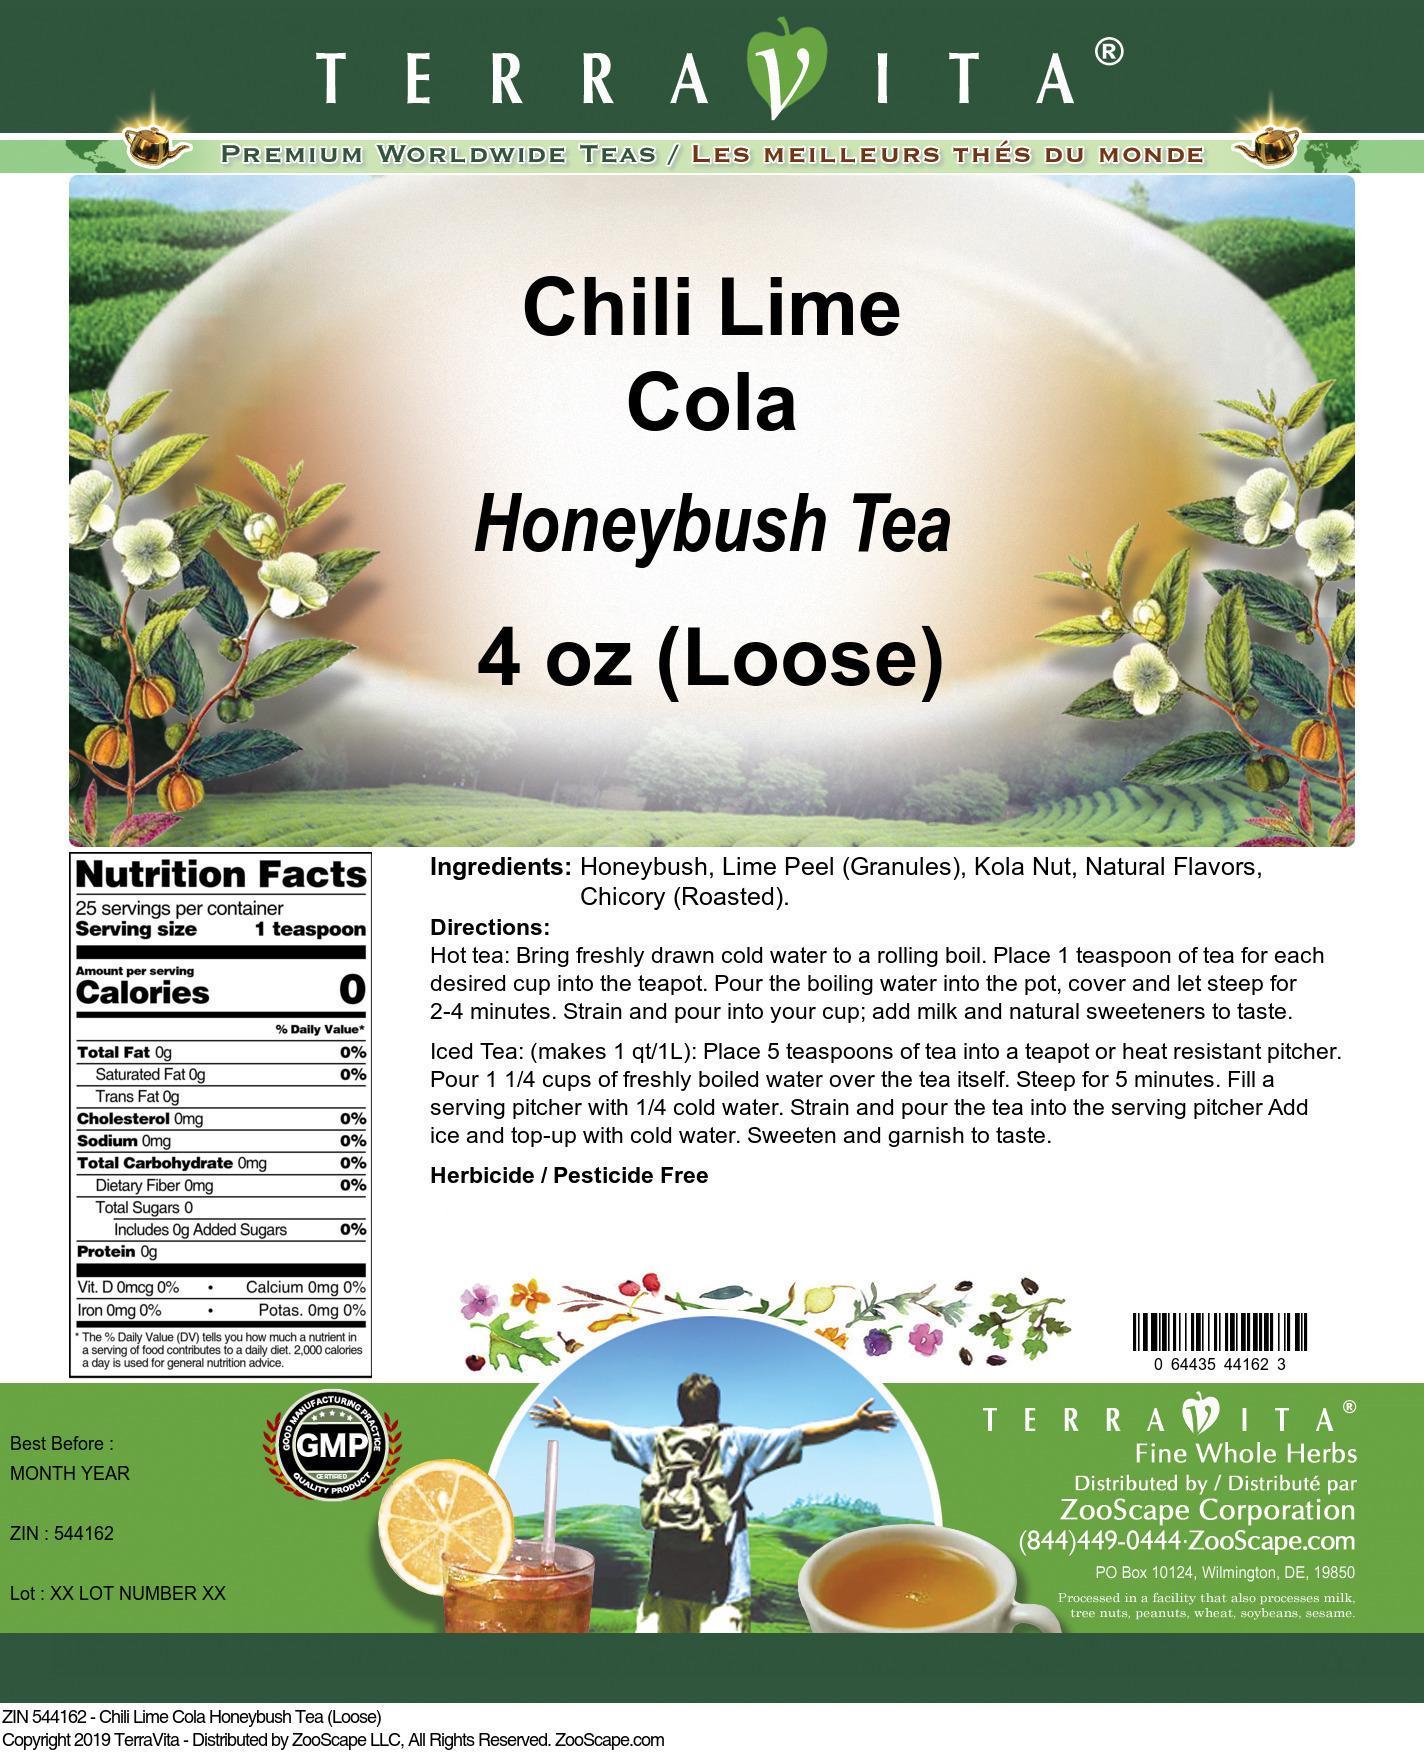 Chili Lime Cola Honeybush Tea (Loose)